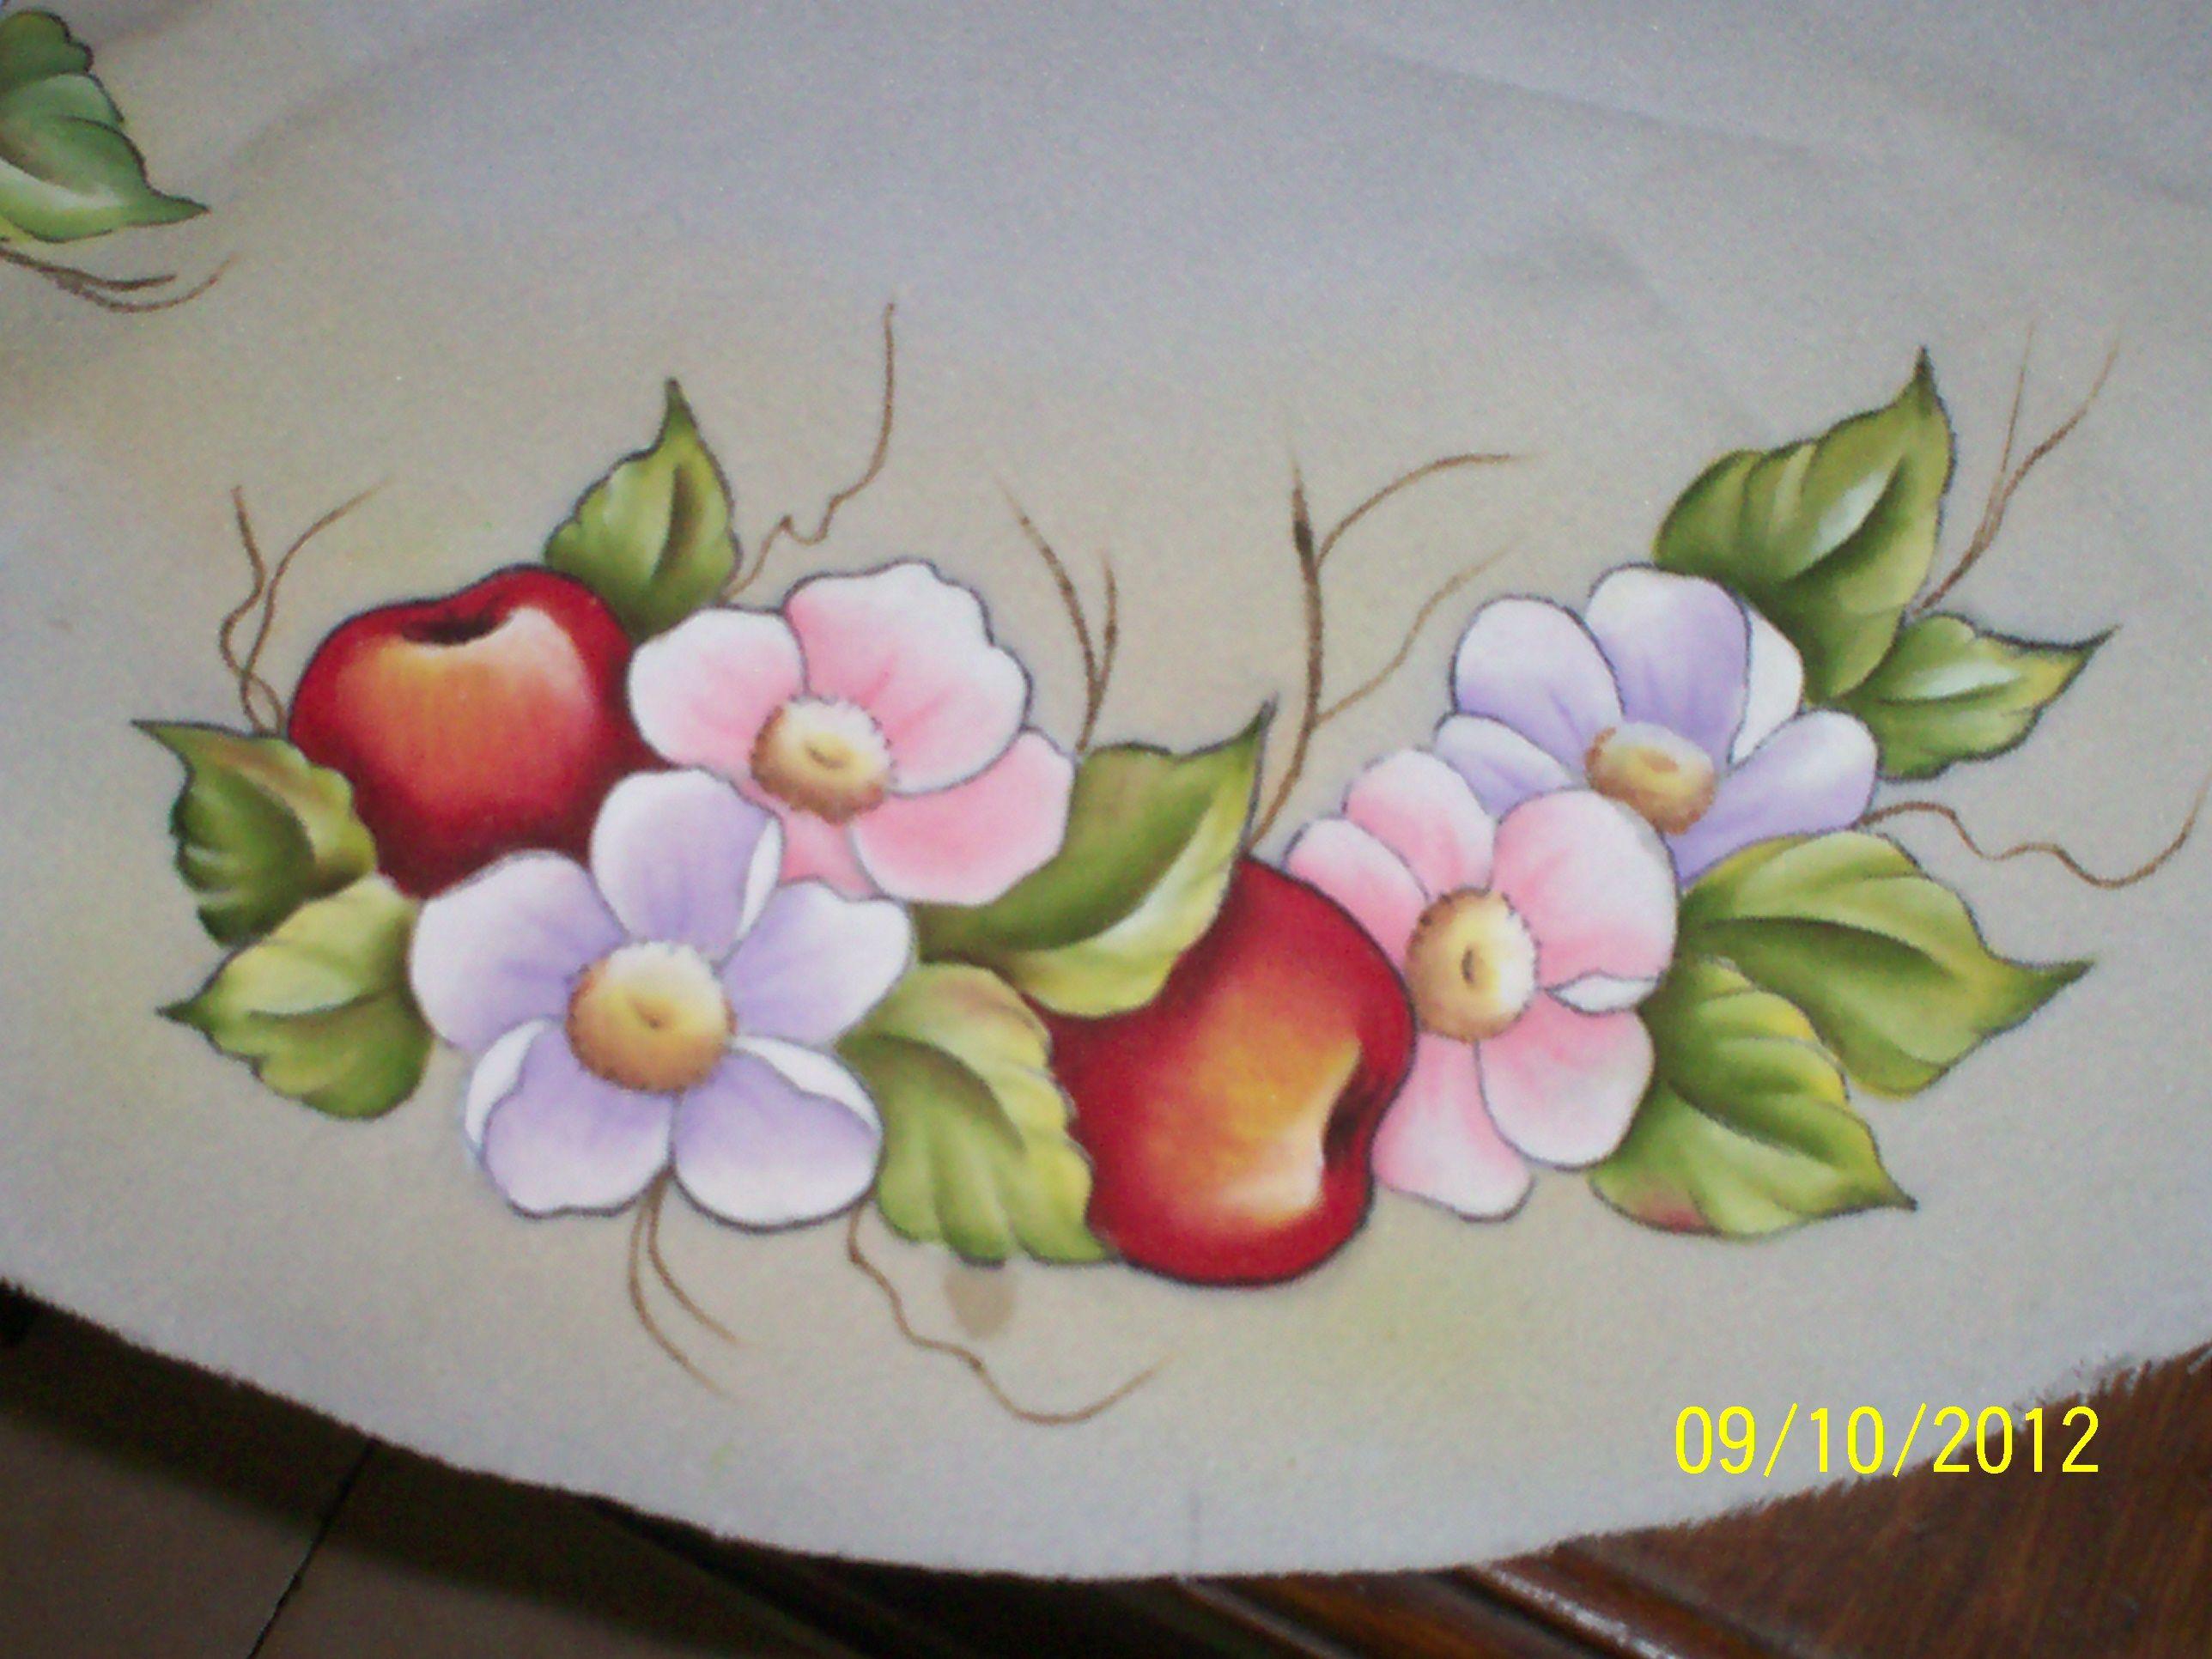 Pintura sobre tela pintura en tela pinterest pintura en tela pintar y pintura textil - Como pintar sobre tela ...